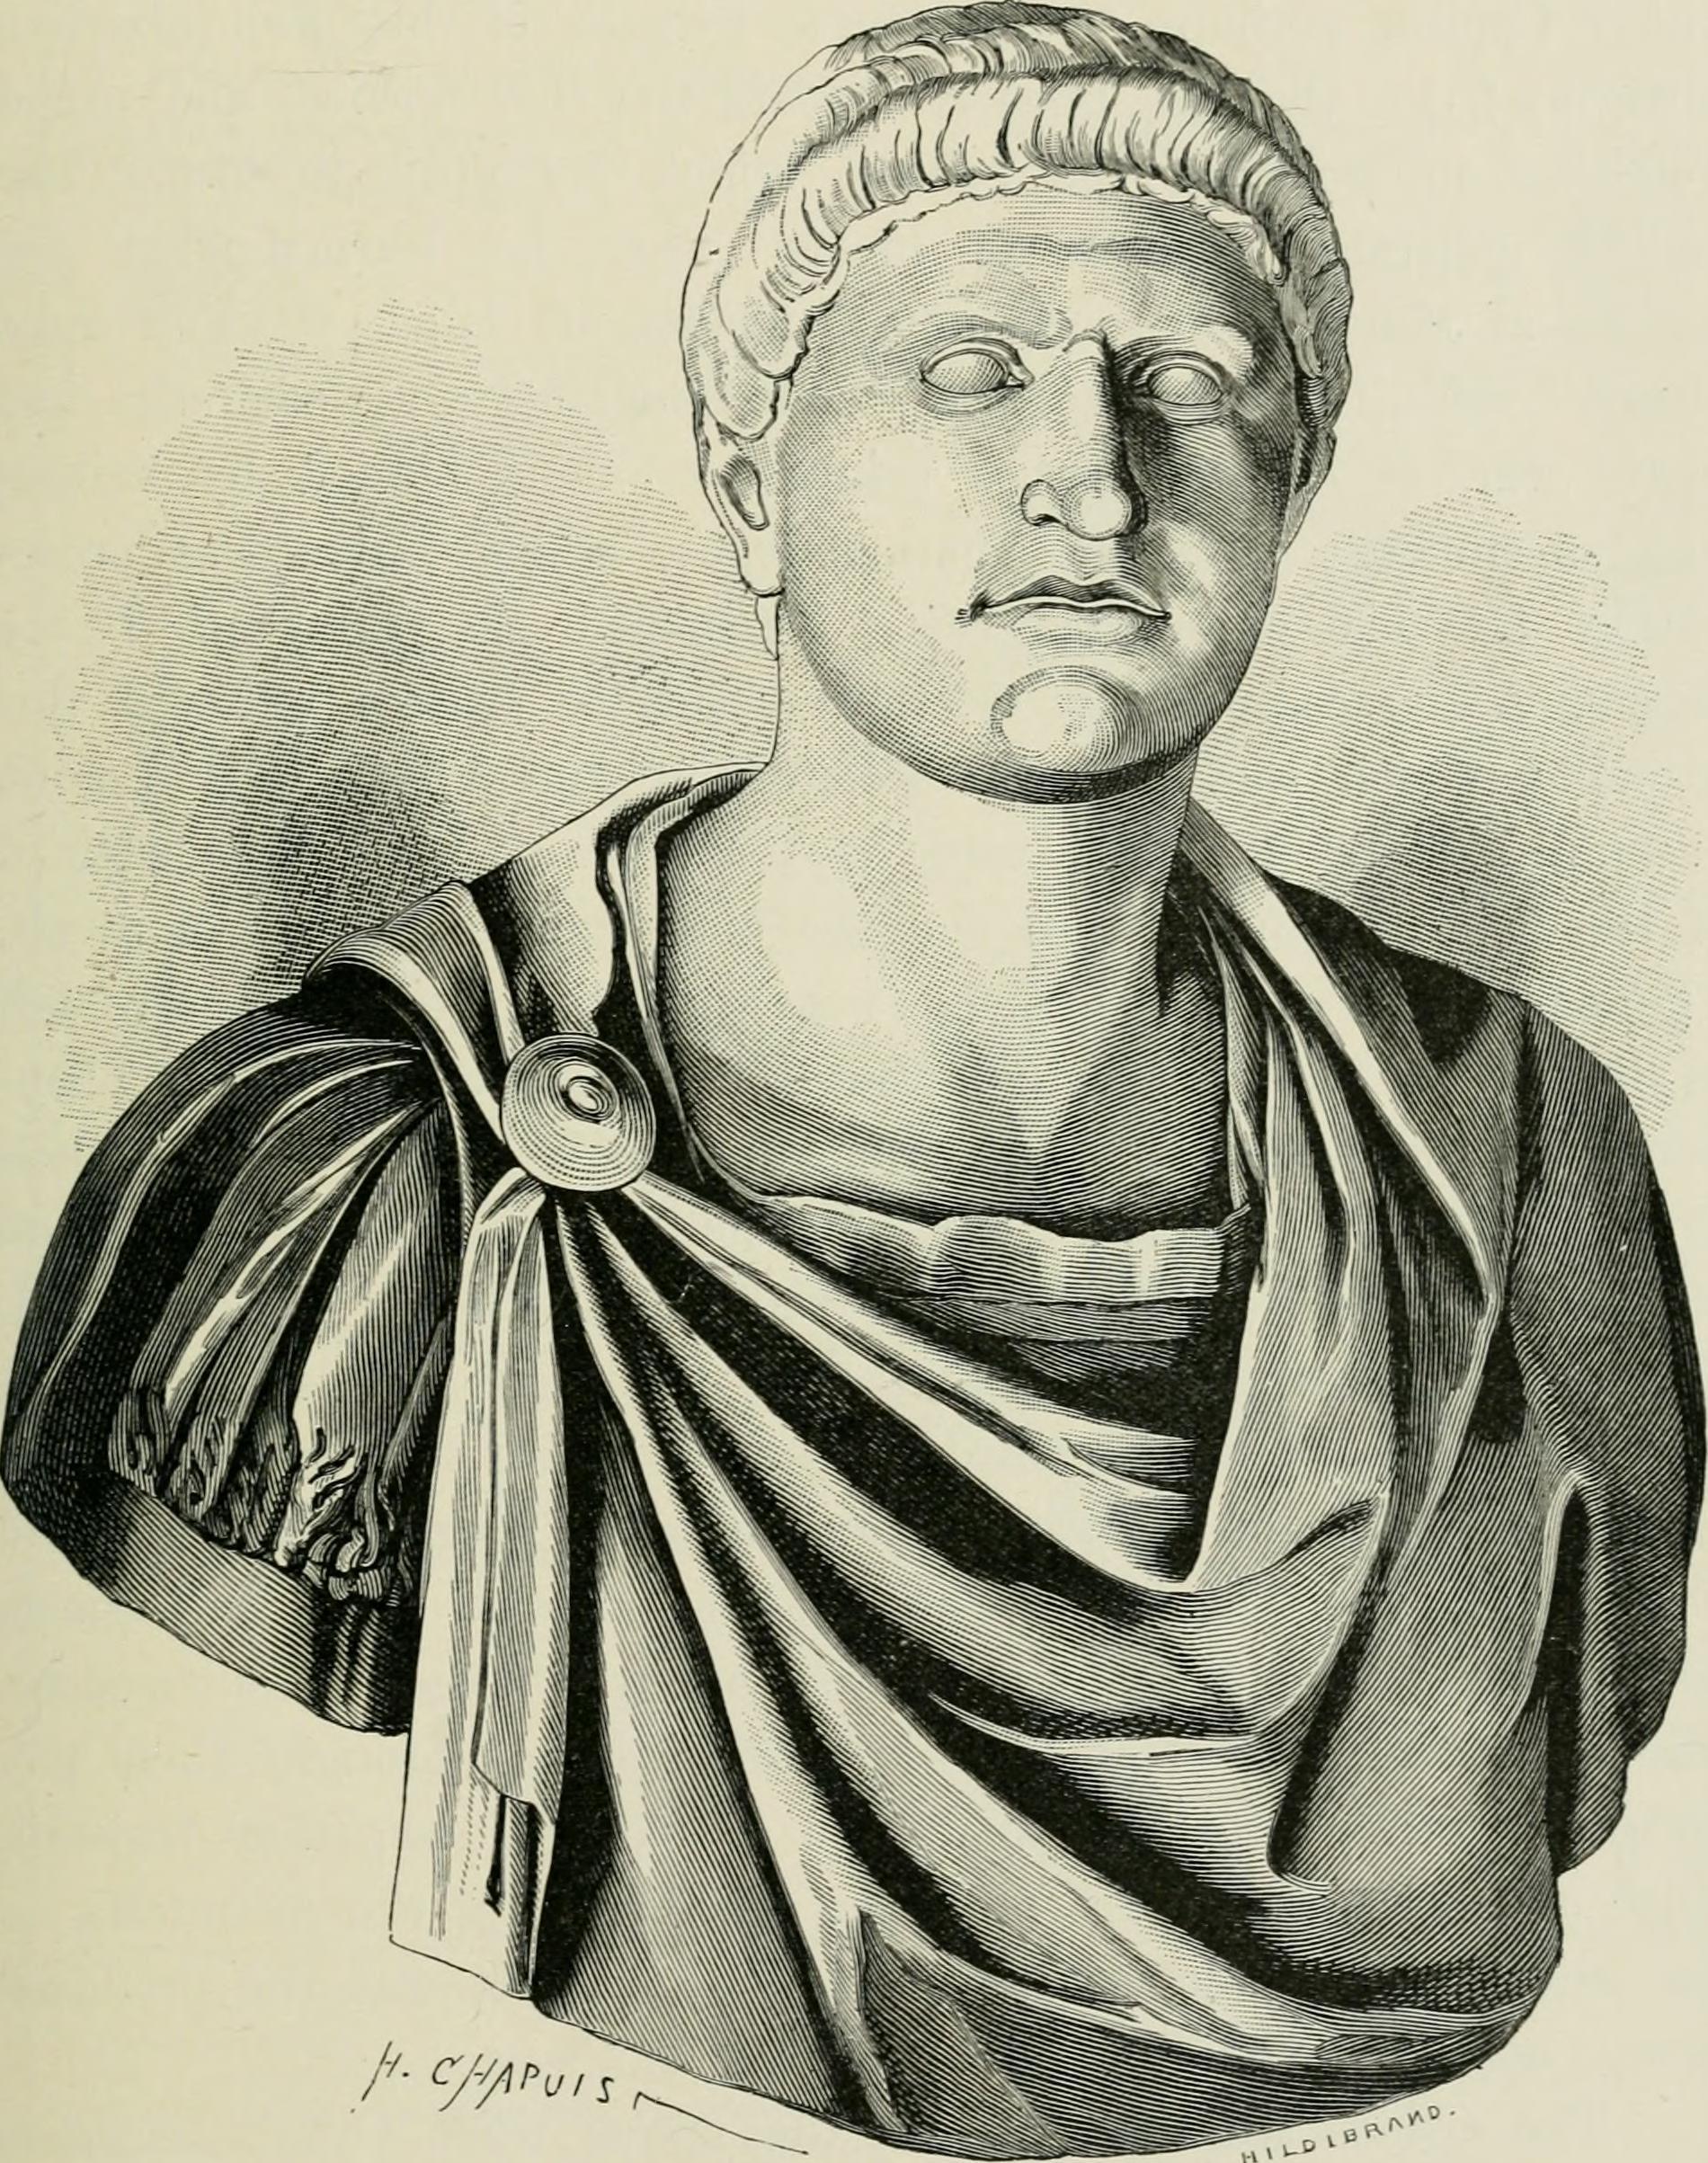 Otho and Vitellius